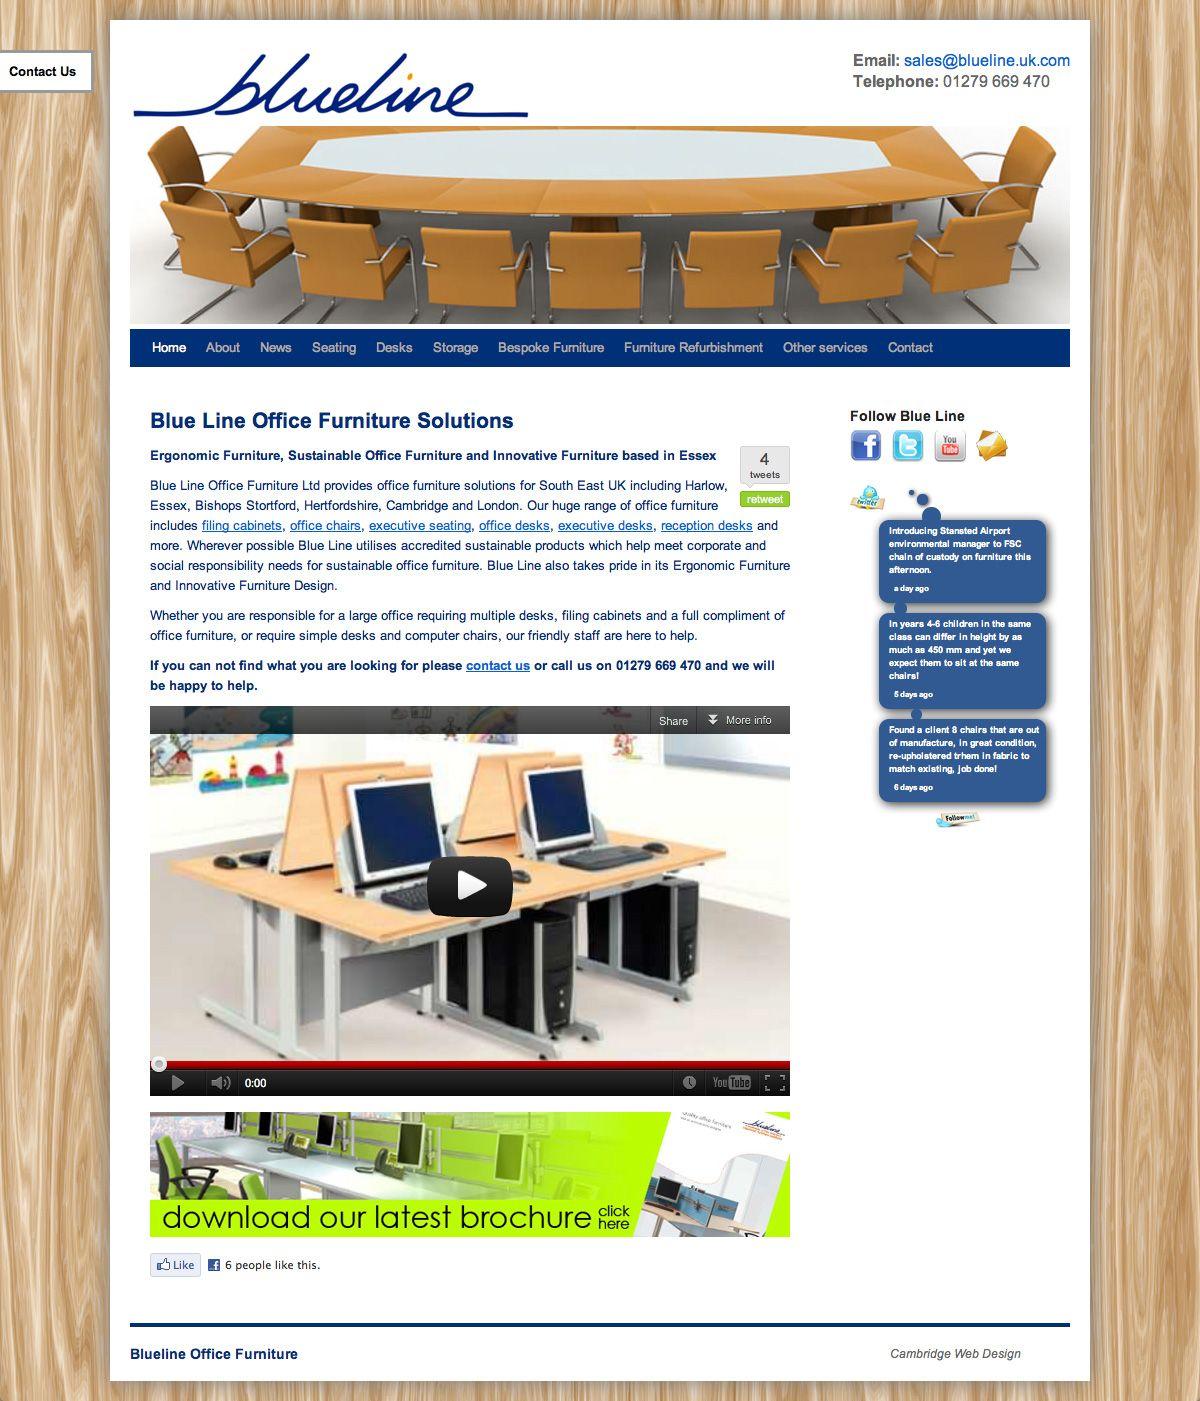 Blueline Office Furniture Website